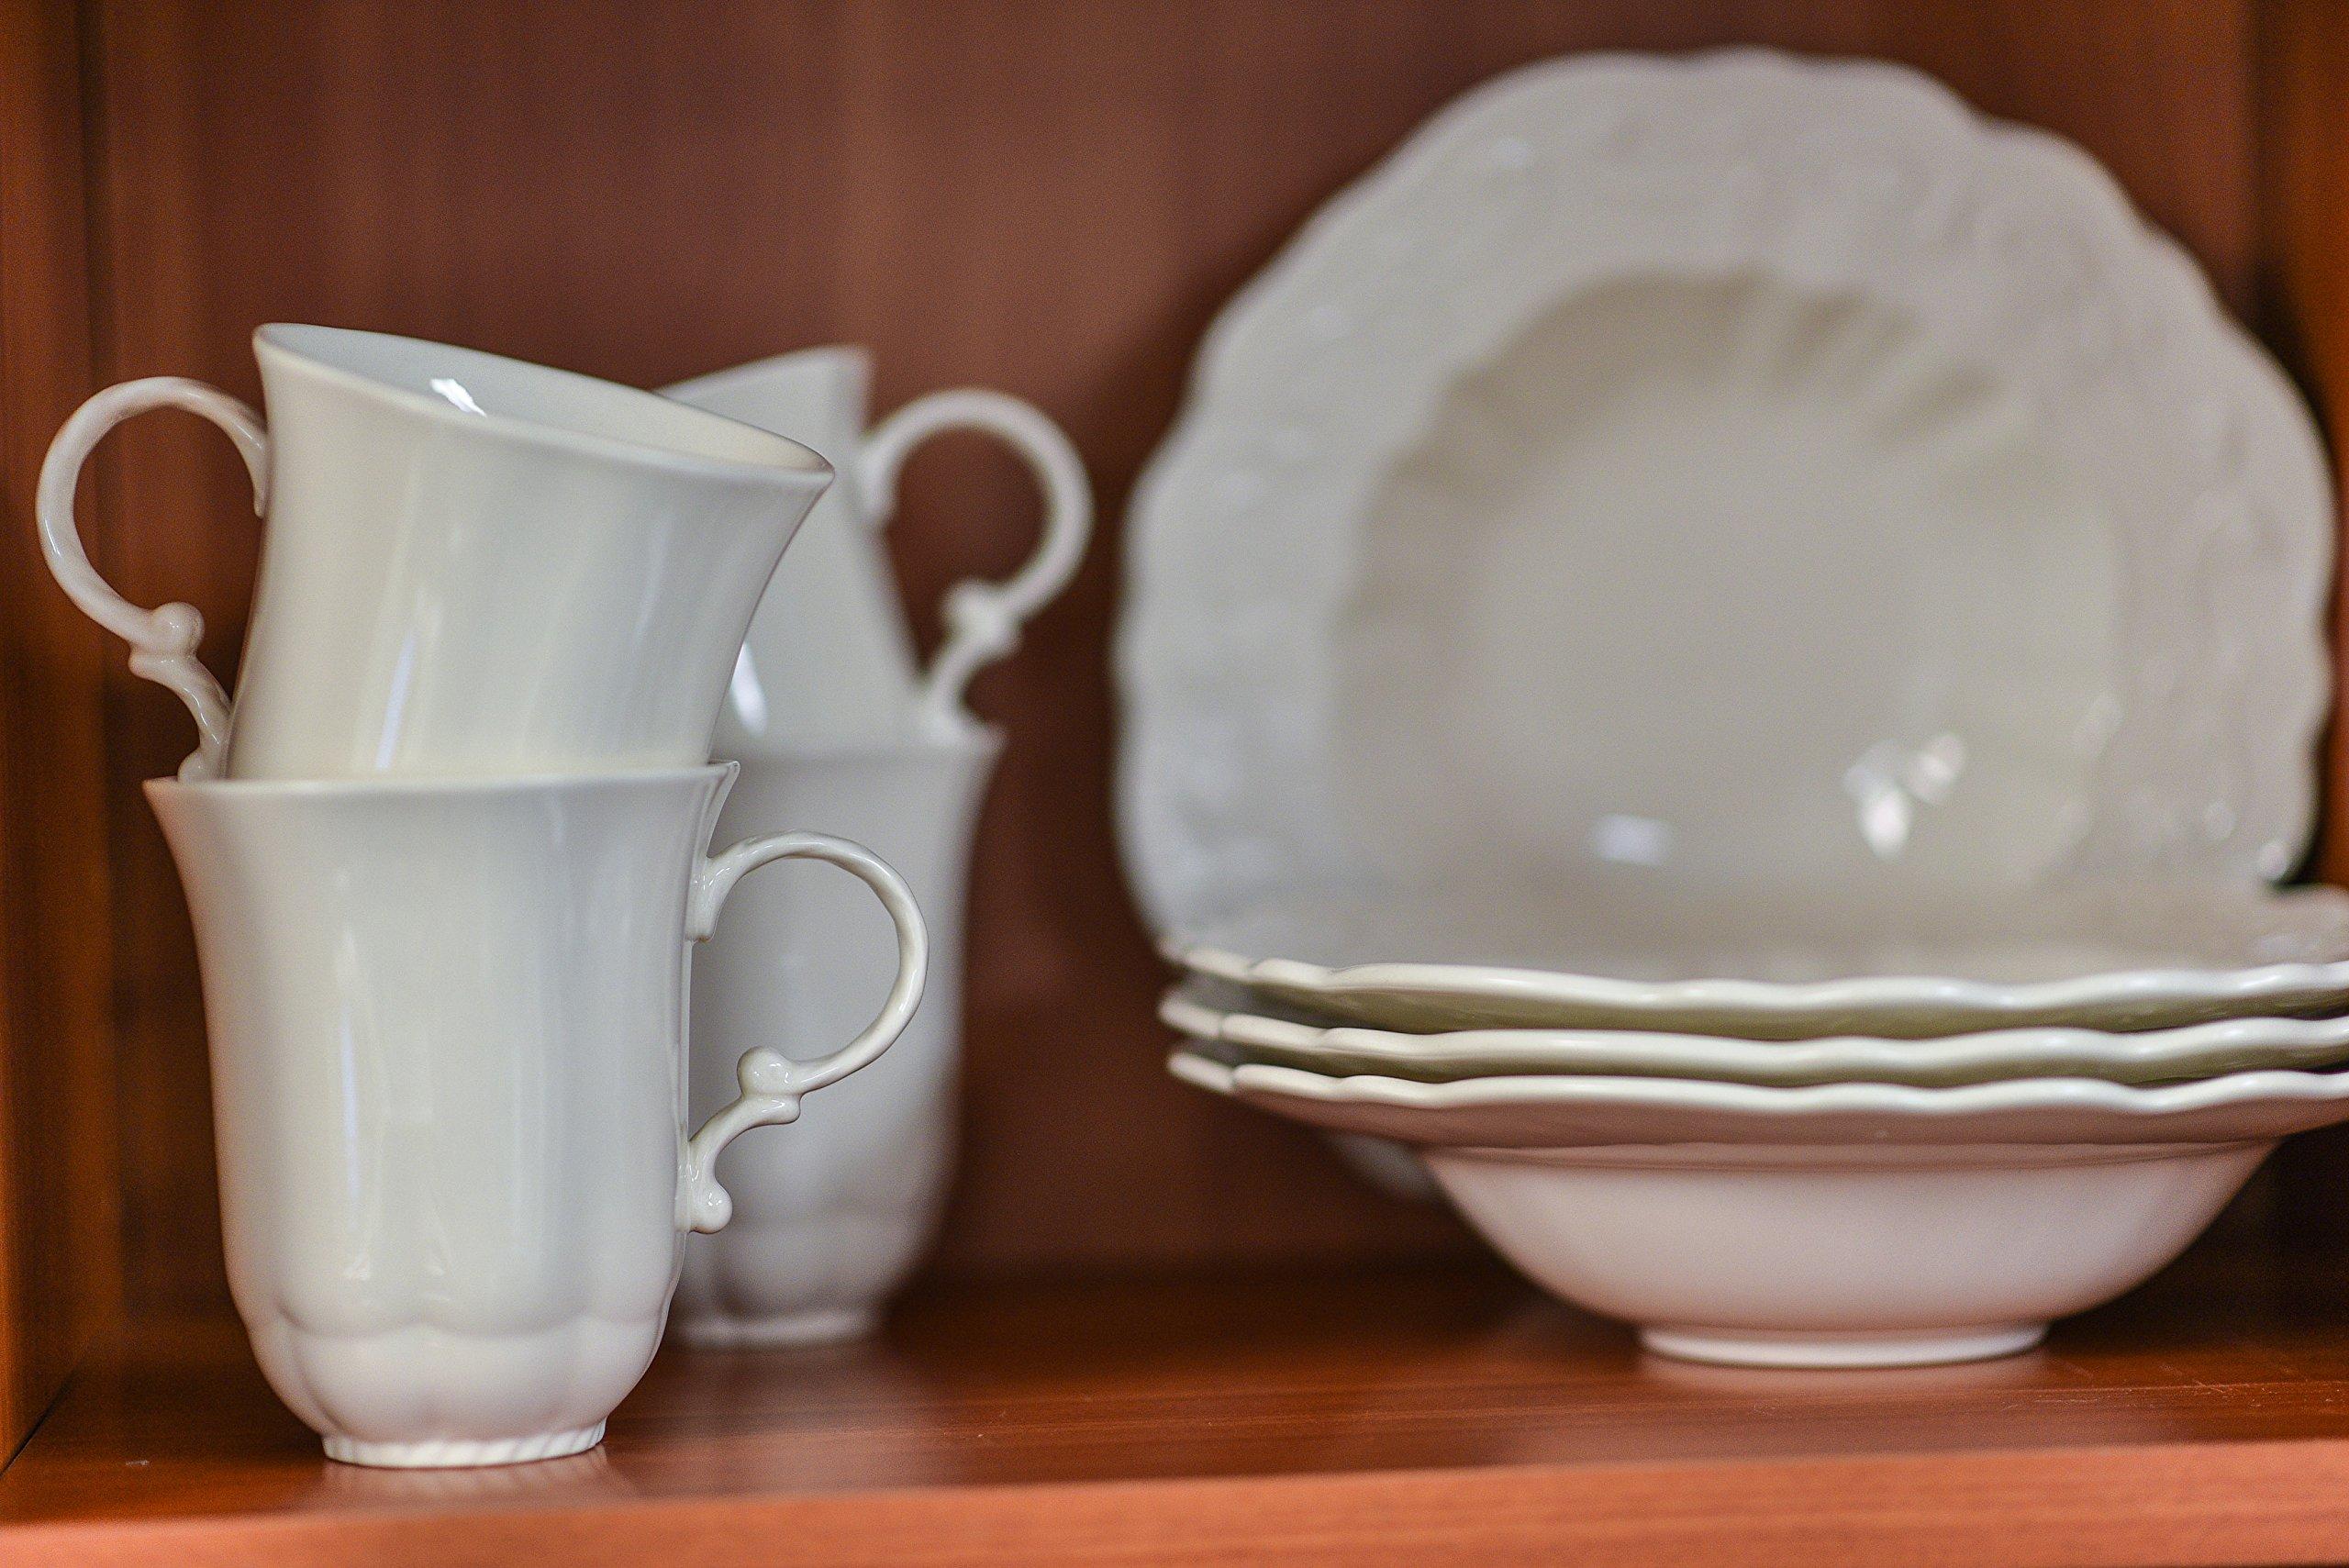 "Red Vanilla FQ900-005 Country Estate 5-Piece Serveware Set, White - (1) Vegetable Bowl 9.5"" 90 oz., (1) Covered Sugar Bowl 12 oz., (1) Creamer 10 oz., (1) Round Platter 13"" Made of Stoneware Dishwasher Safe - kitchen-tabletop, kitchen-dining-room, dinnerware-sets - 91hxL1Lo4oL -"